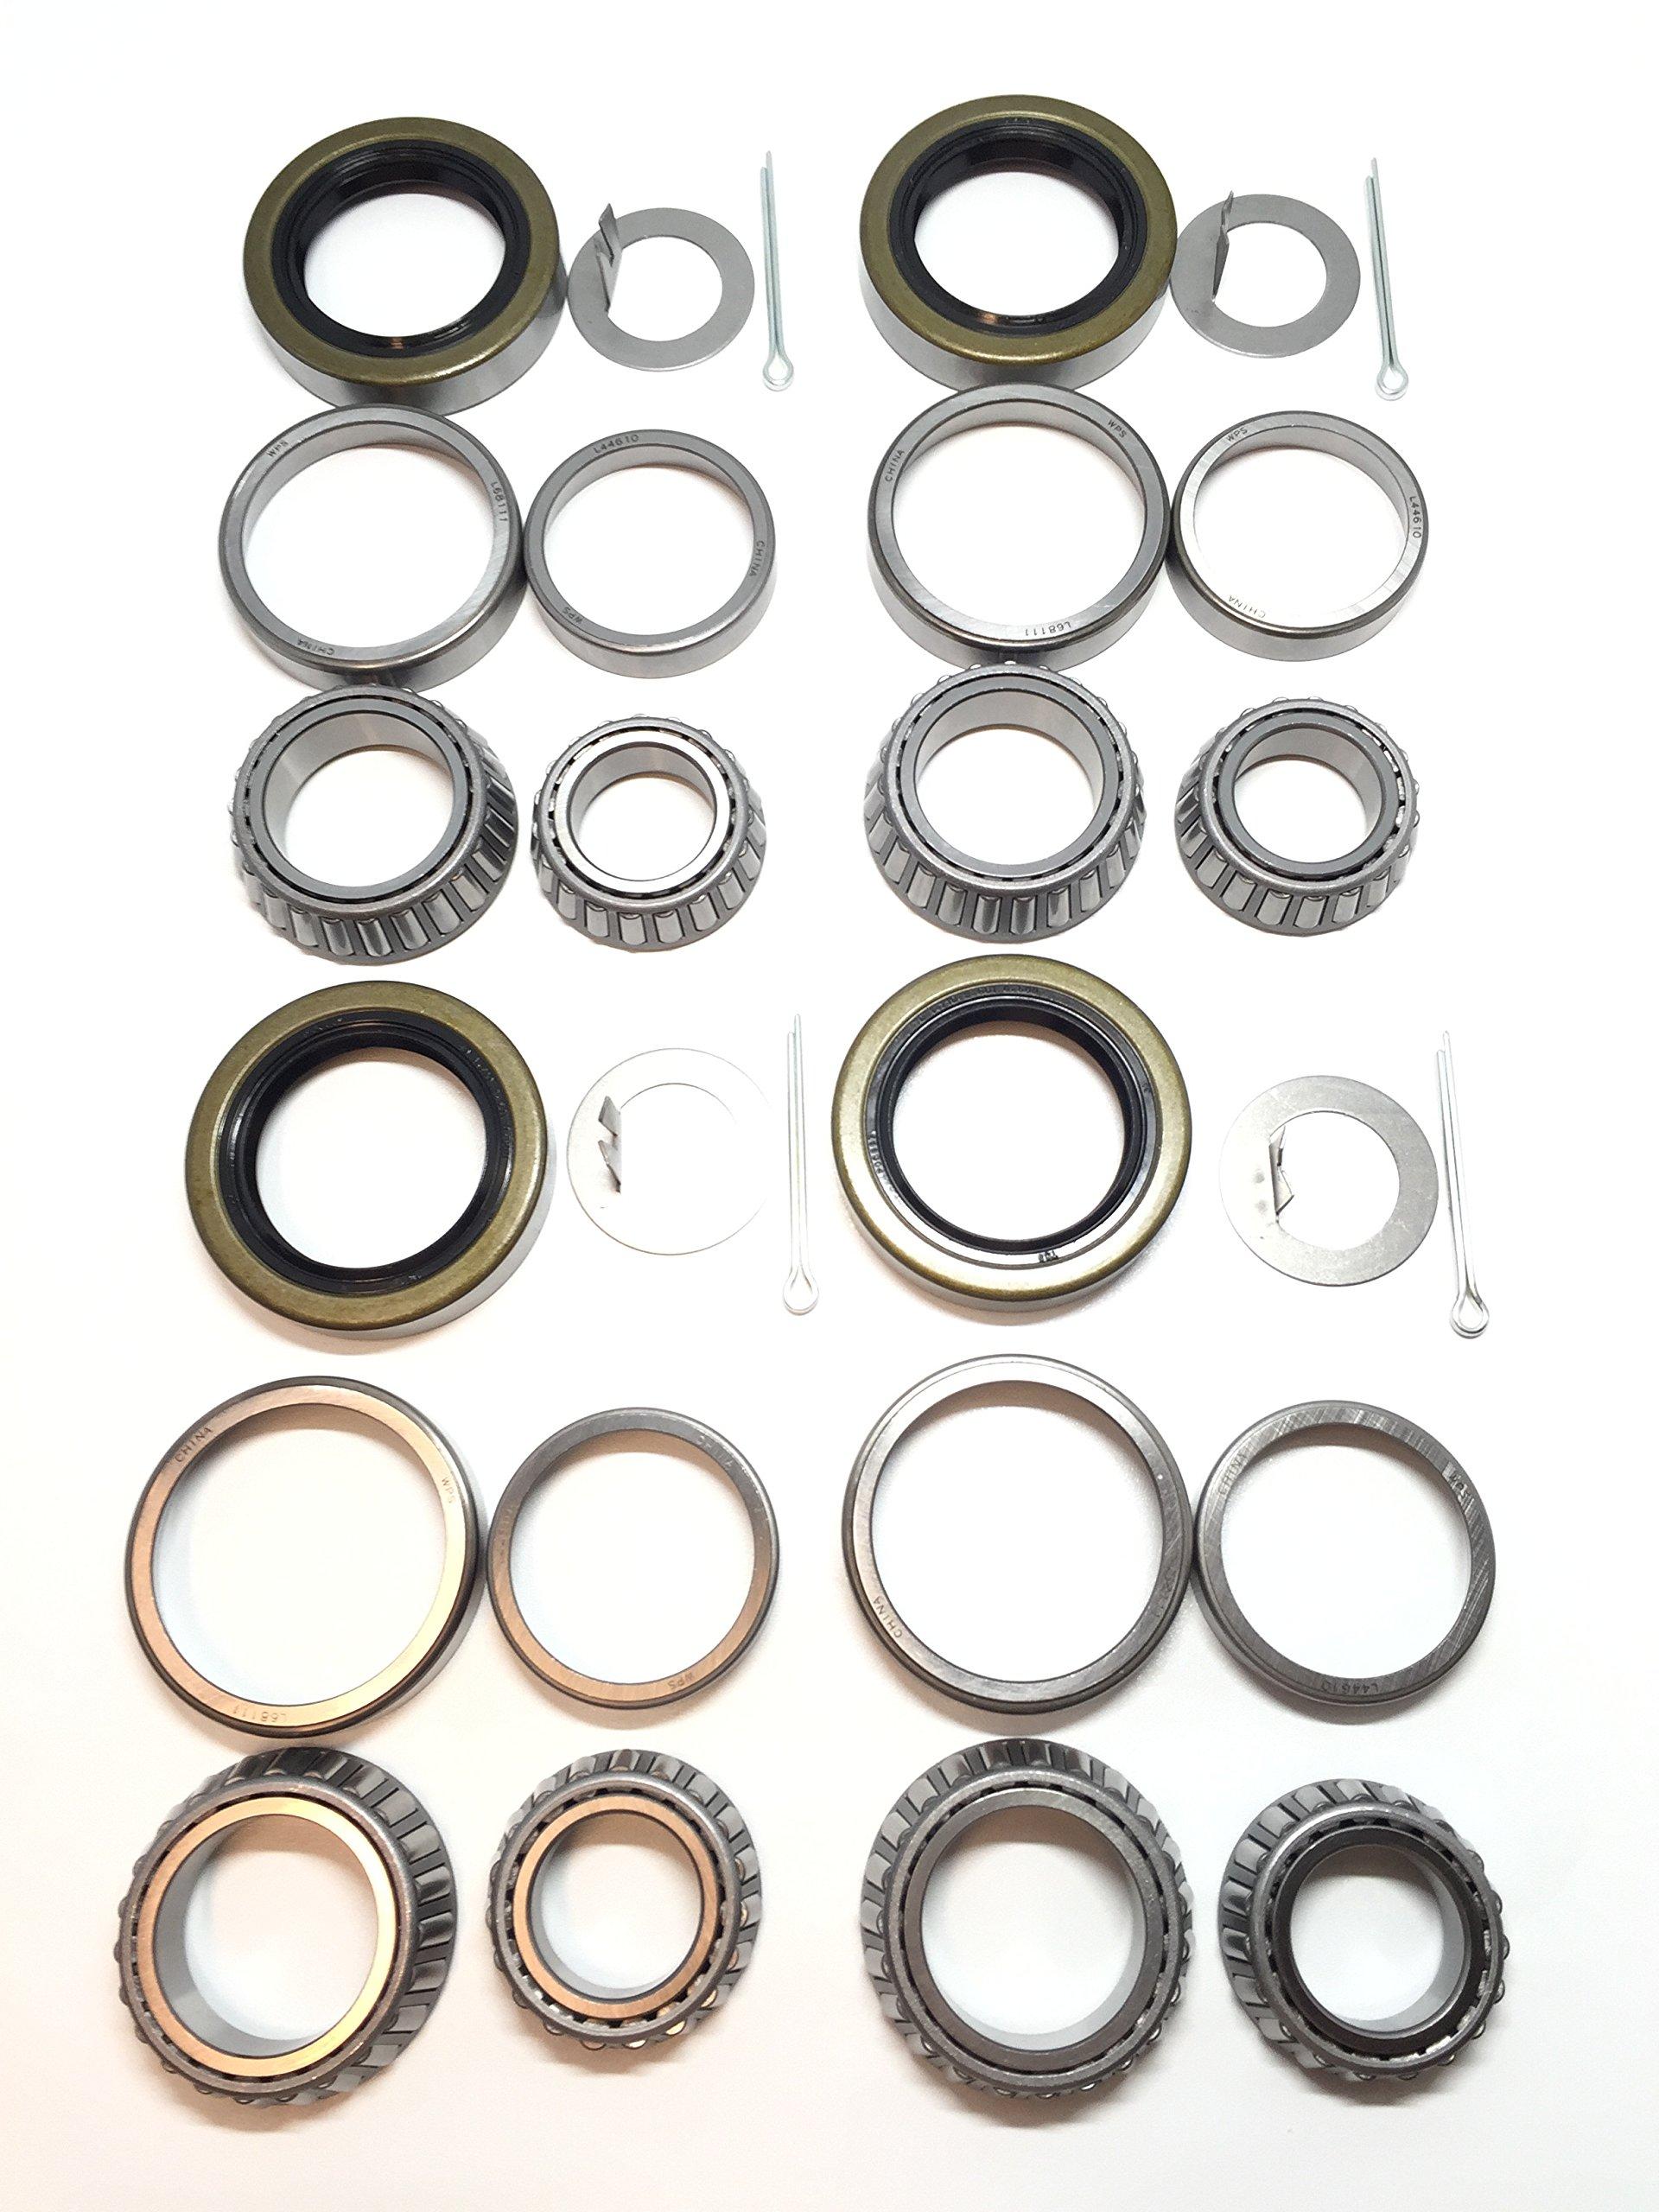 Pack of 4 TM WPS Trailer Hub Wheel Grease Seal 10-19 171255TB 1.719 X 2.565 for 3500# E-Z Lube Axles